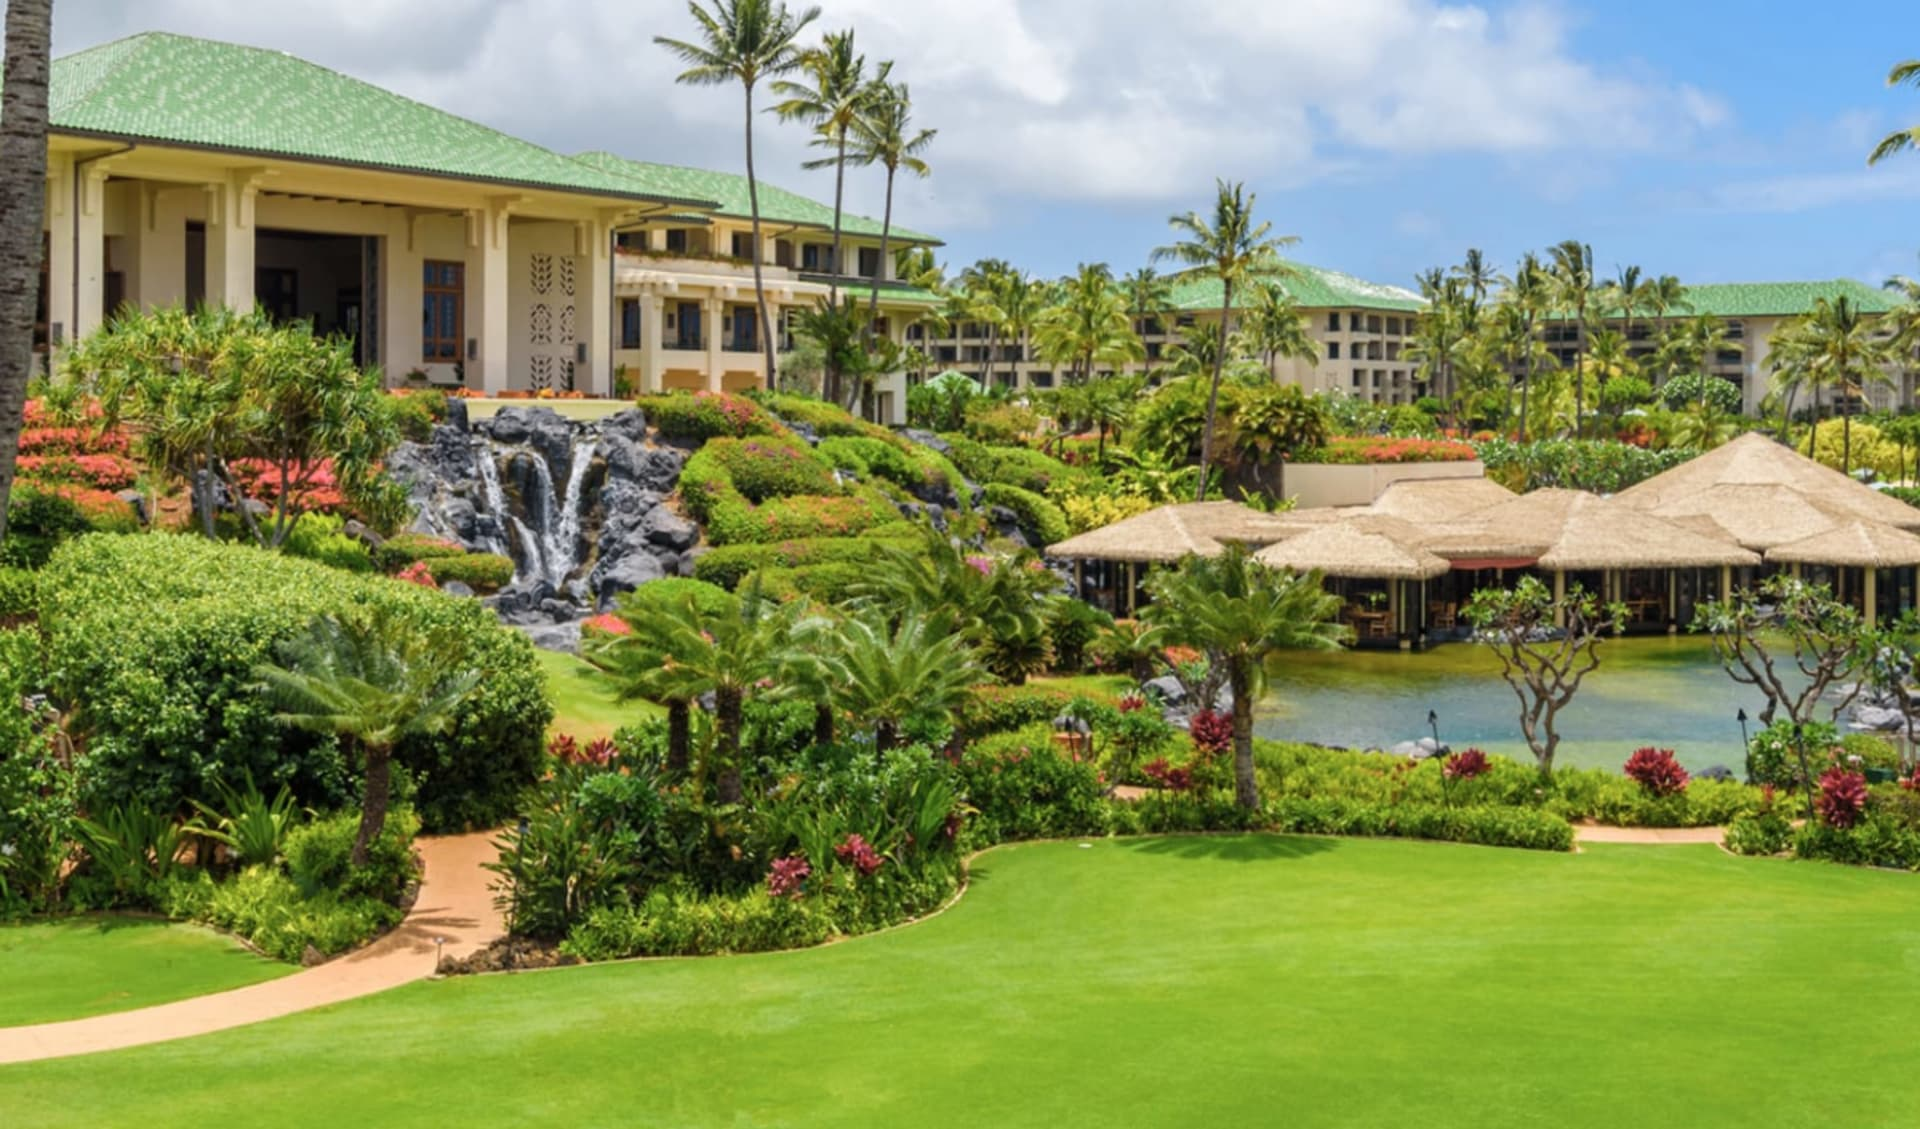 Grand Hyatt Kauai Resort & Spa in Poipu - Kauai: Exterior_Grand Hyatt Kauai Resort_Aussansicht_ATI